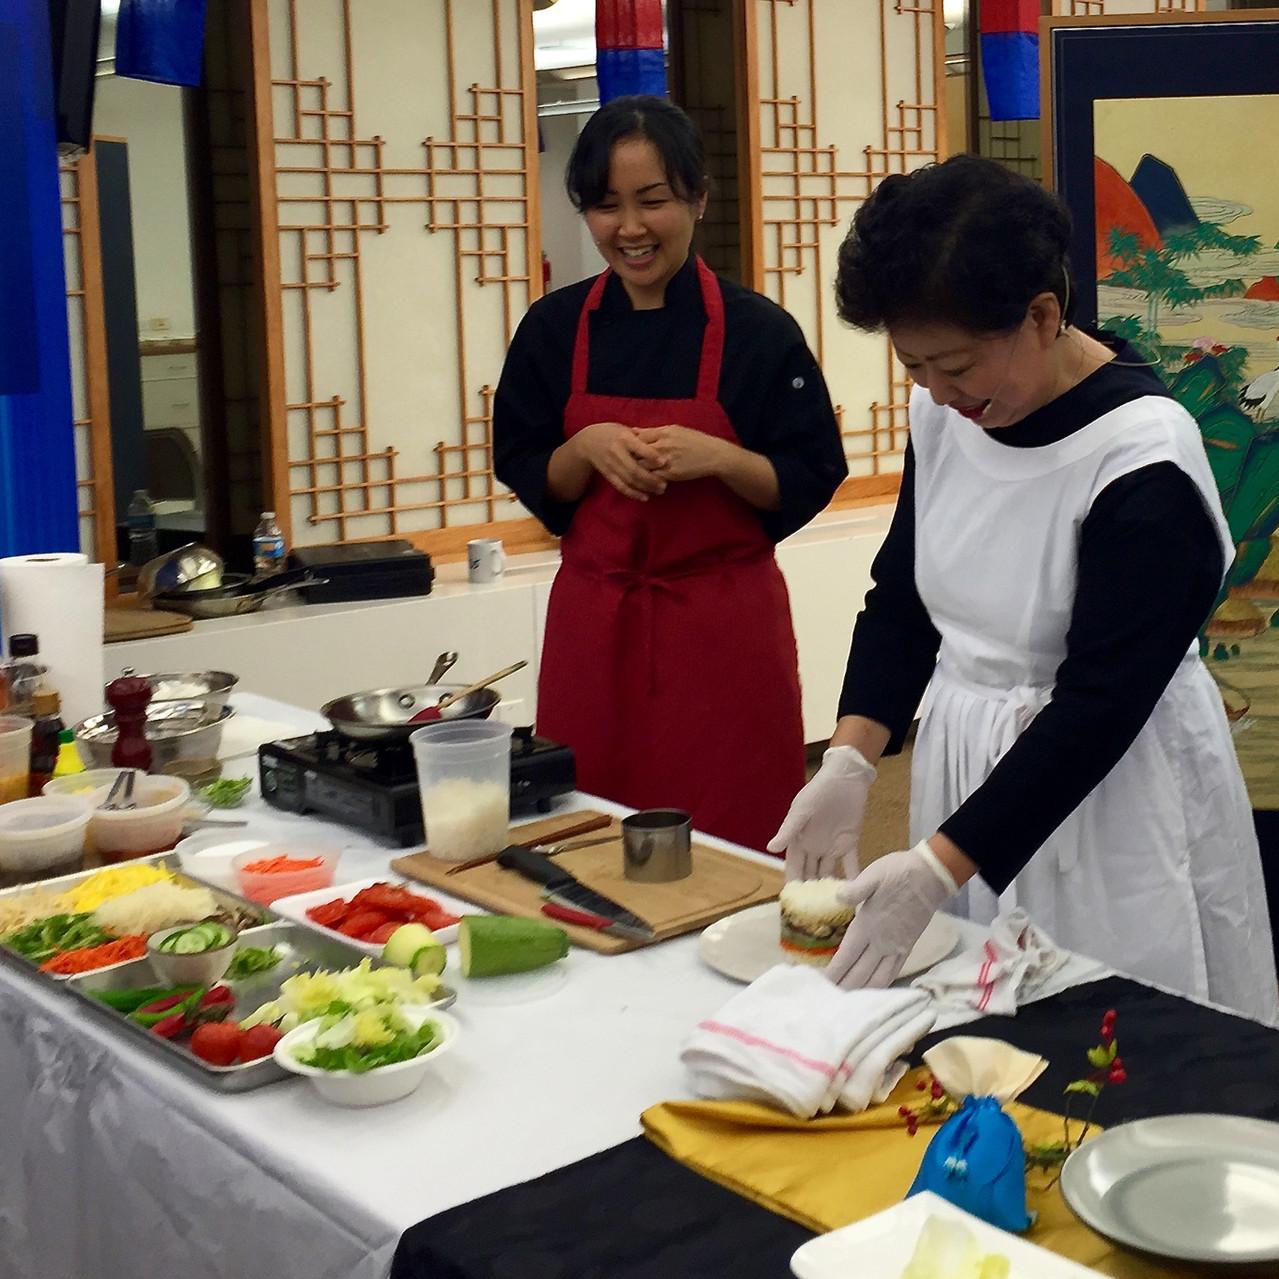 Korean food styling demo